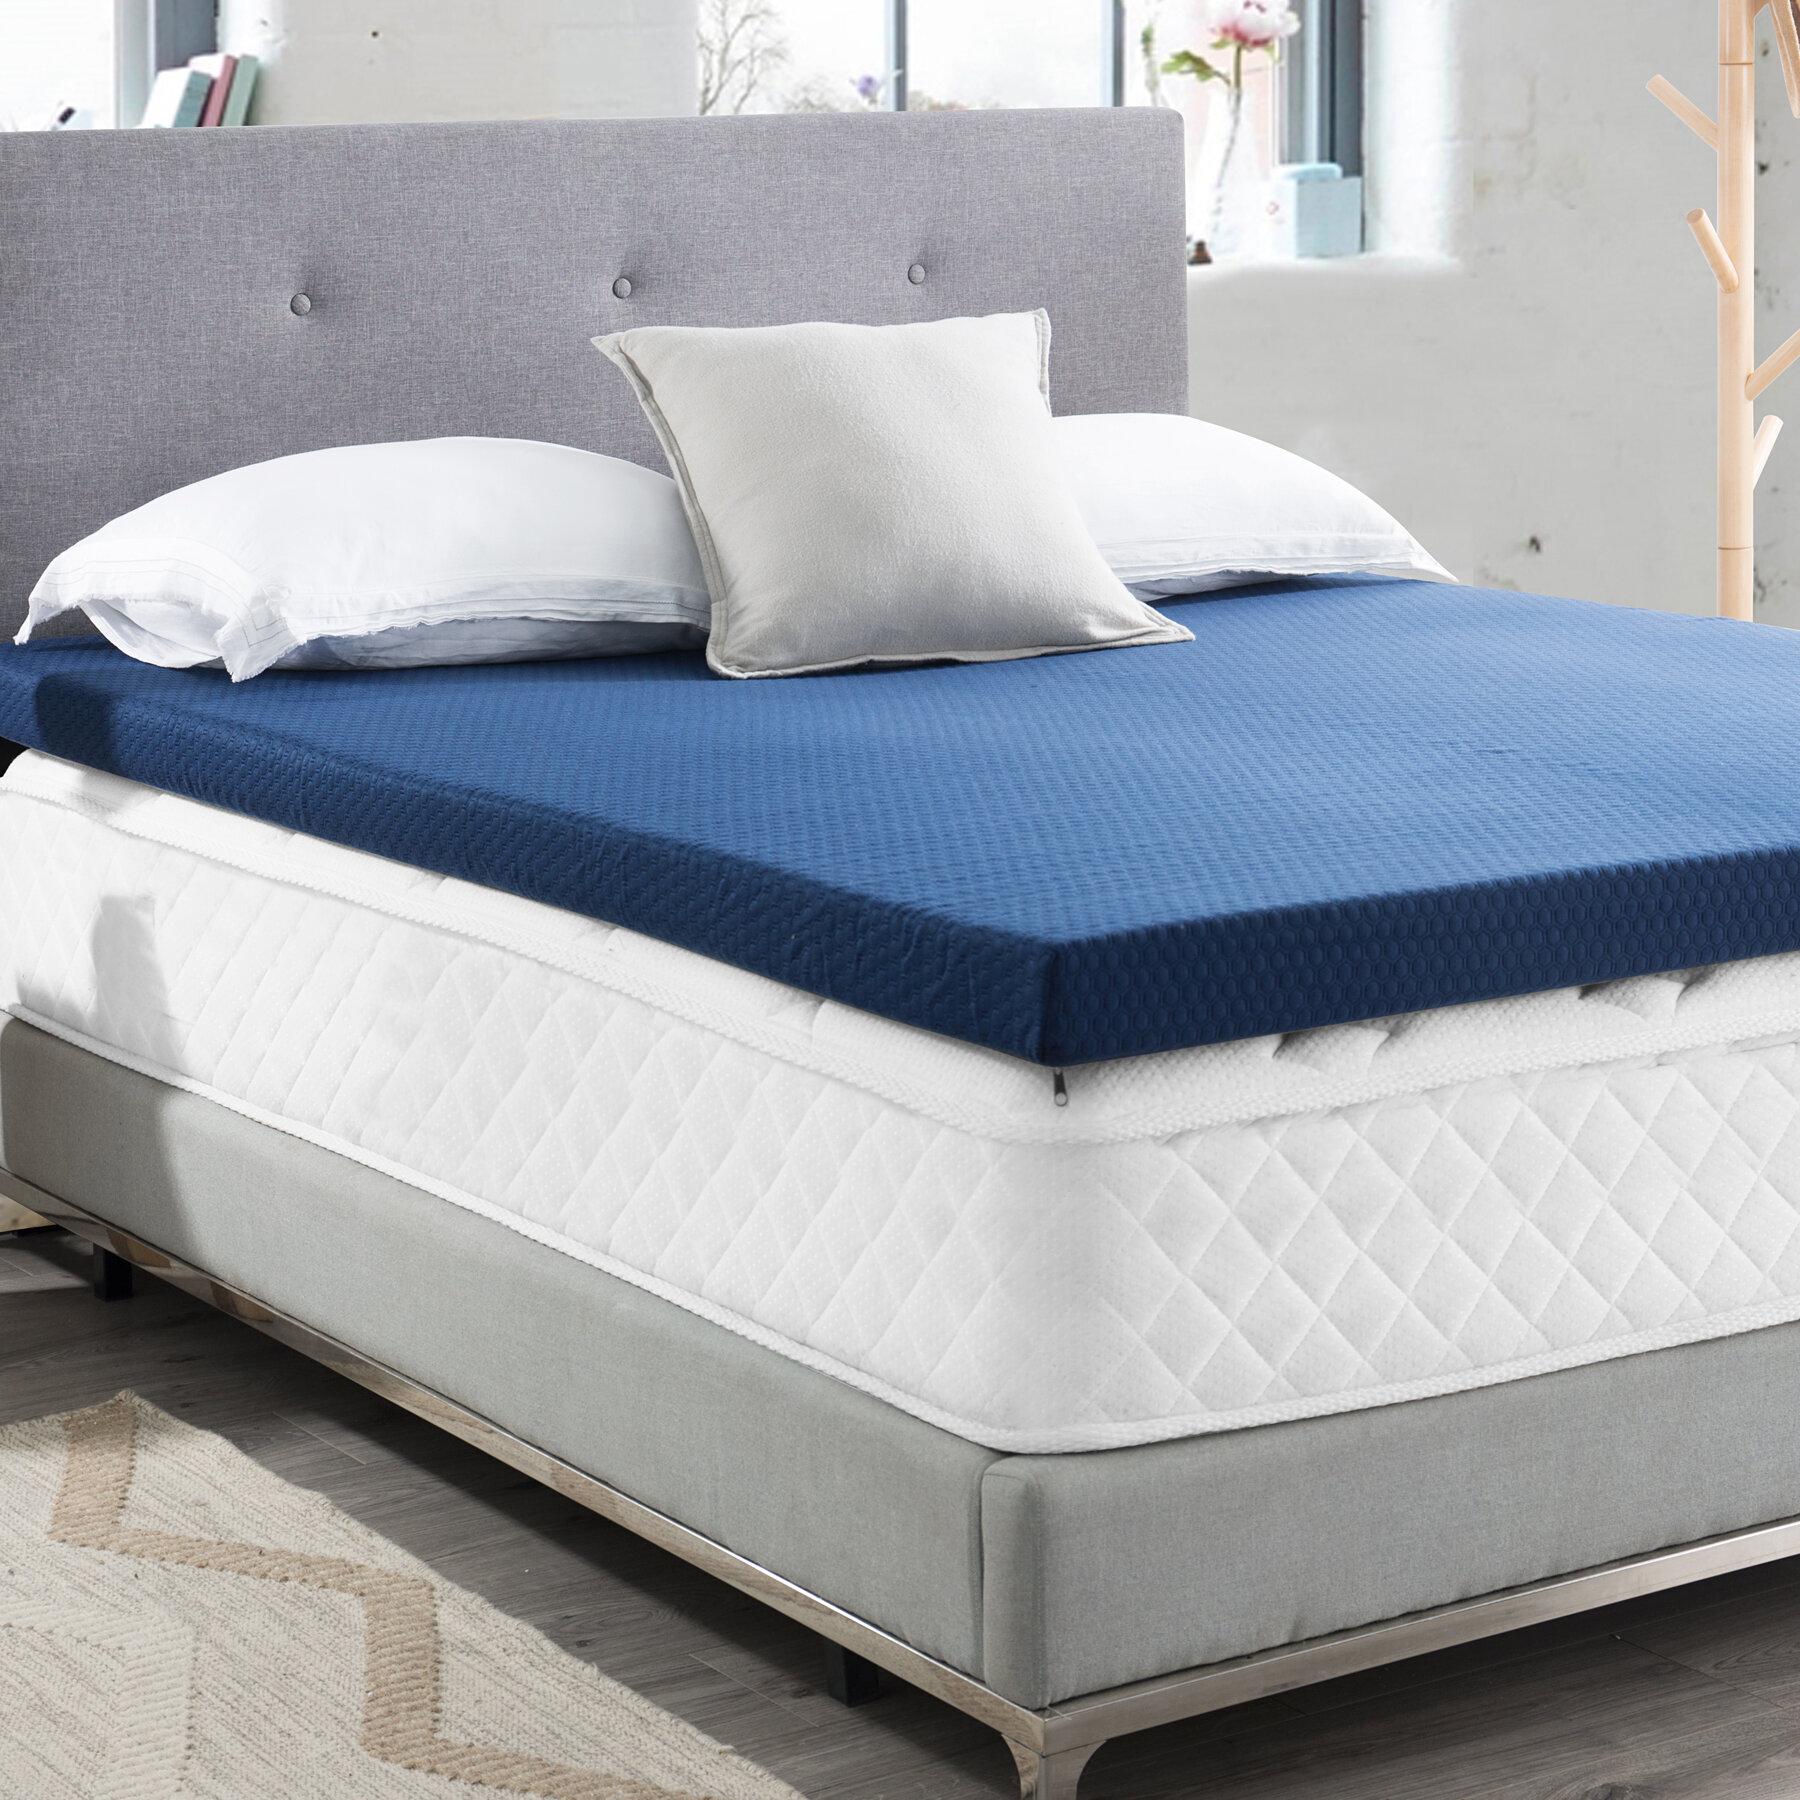 Full Memory Foam Mattress Topper Bed Pad 8 Inch Green Tea Infused